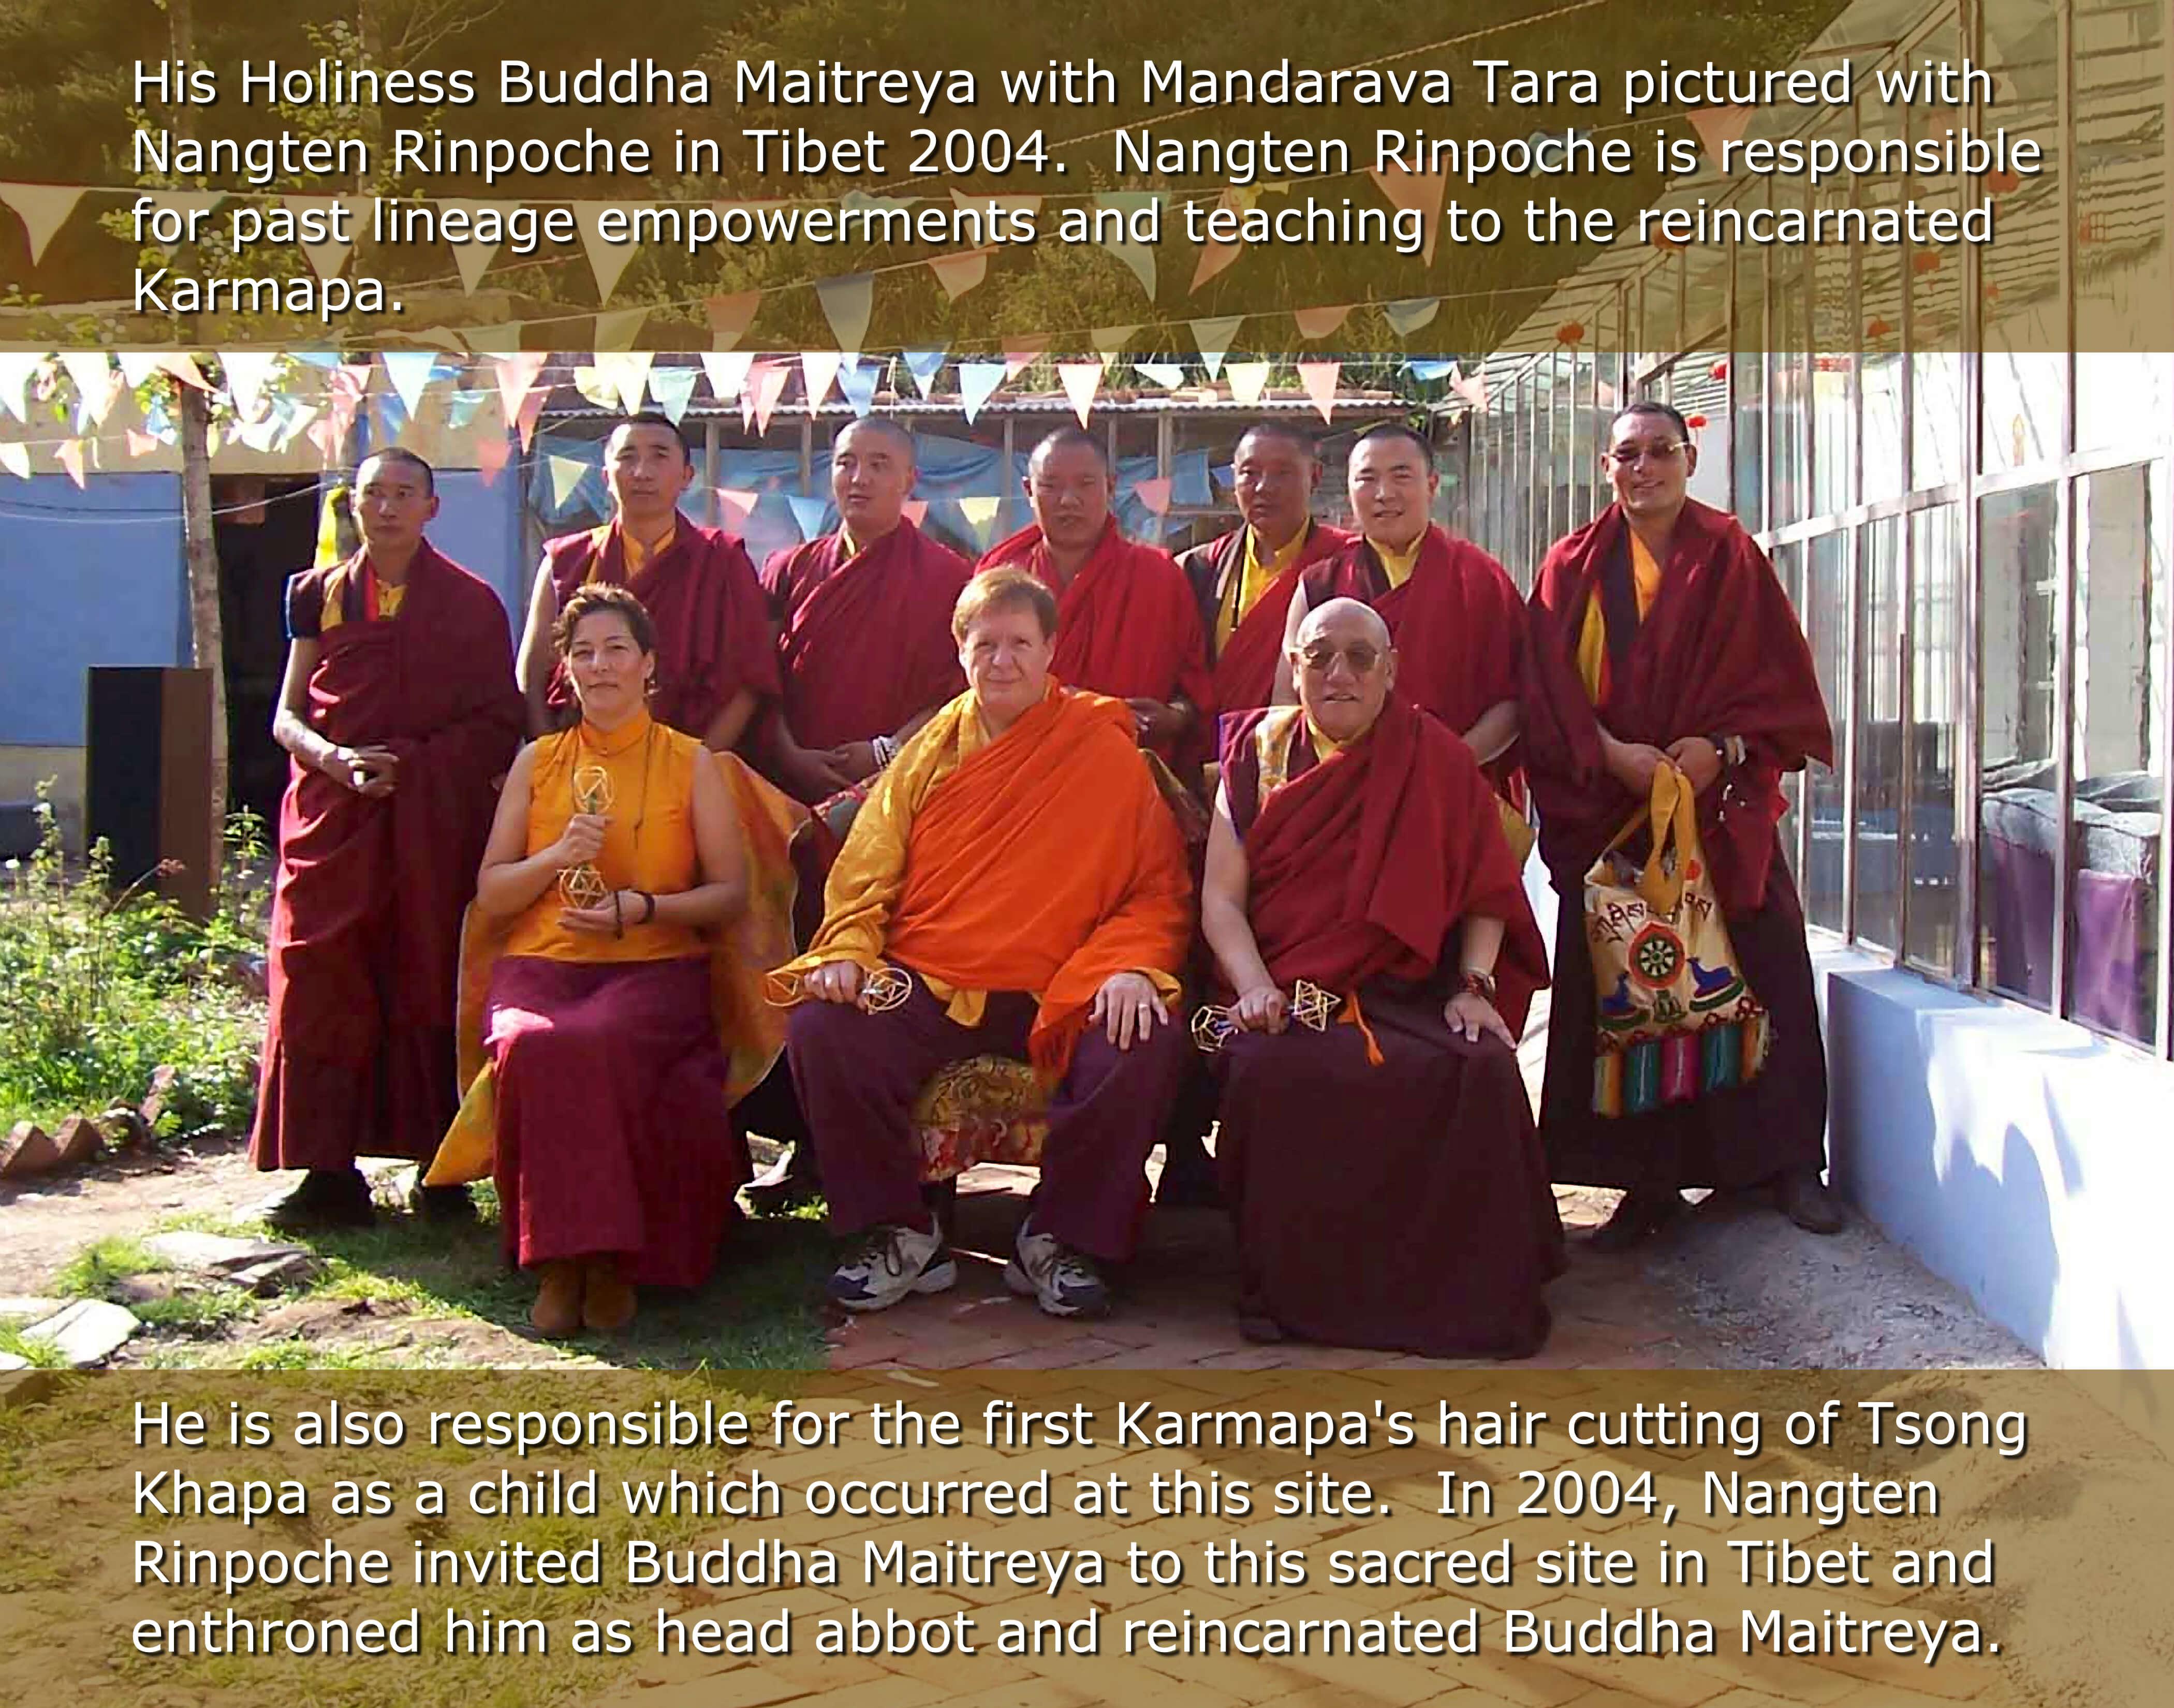 Buddha Maitreya and Mandarava Tara with Nangten Rinpoche